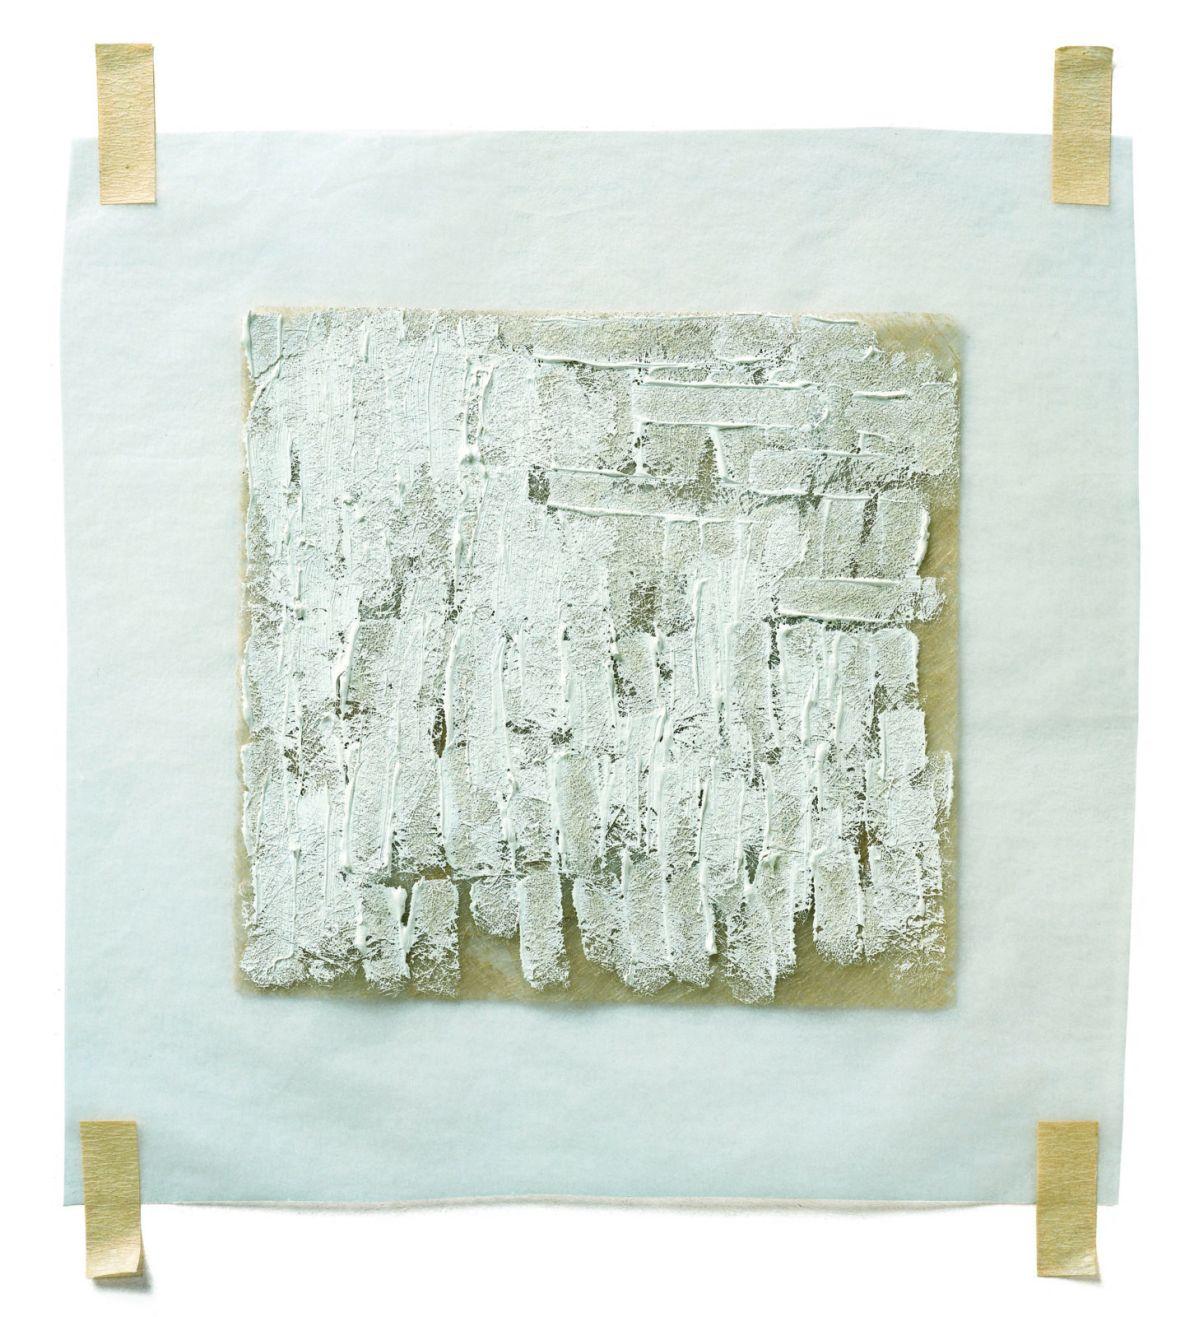 Robert Ryman, Sans titre (Surface Veil), 1970